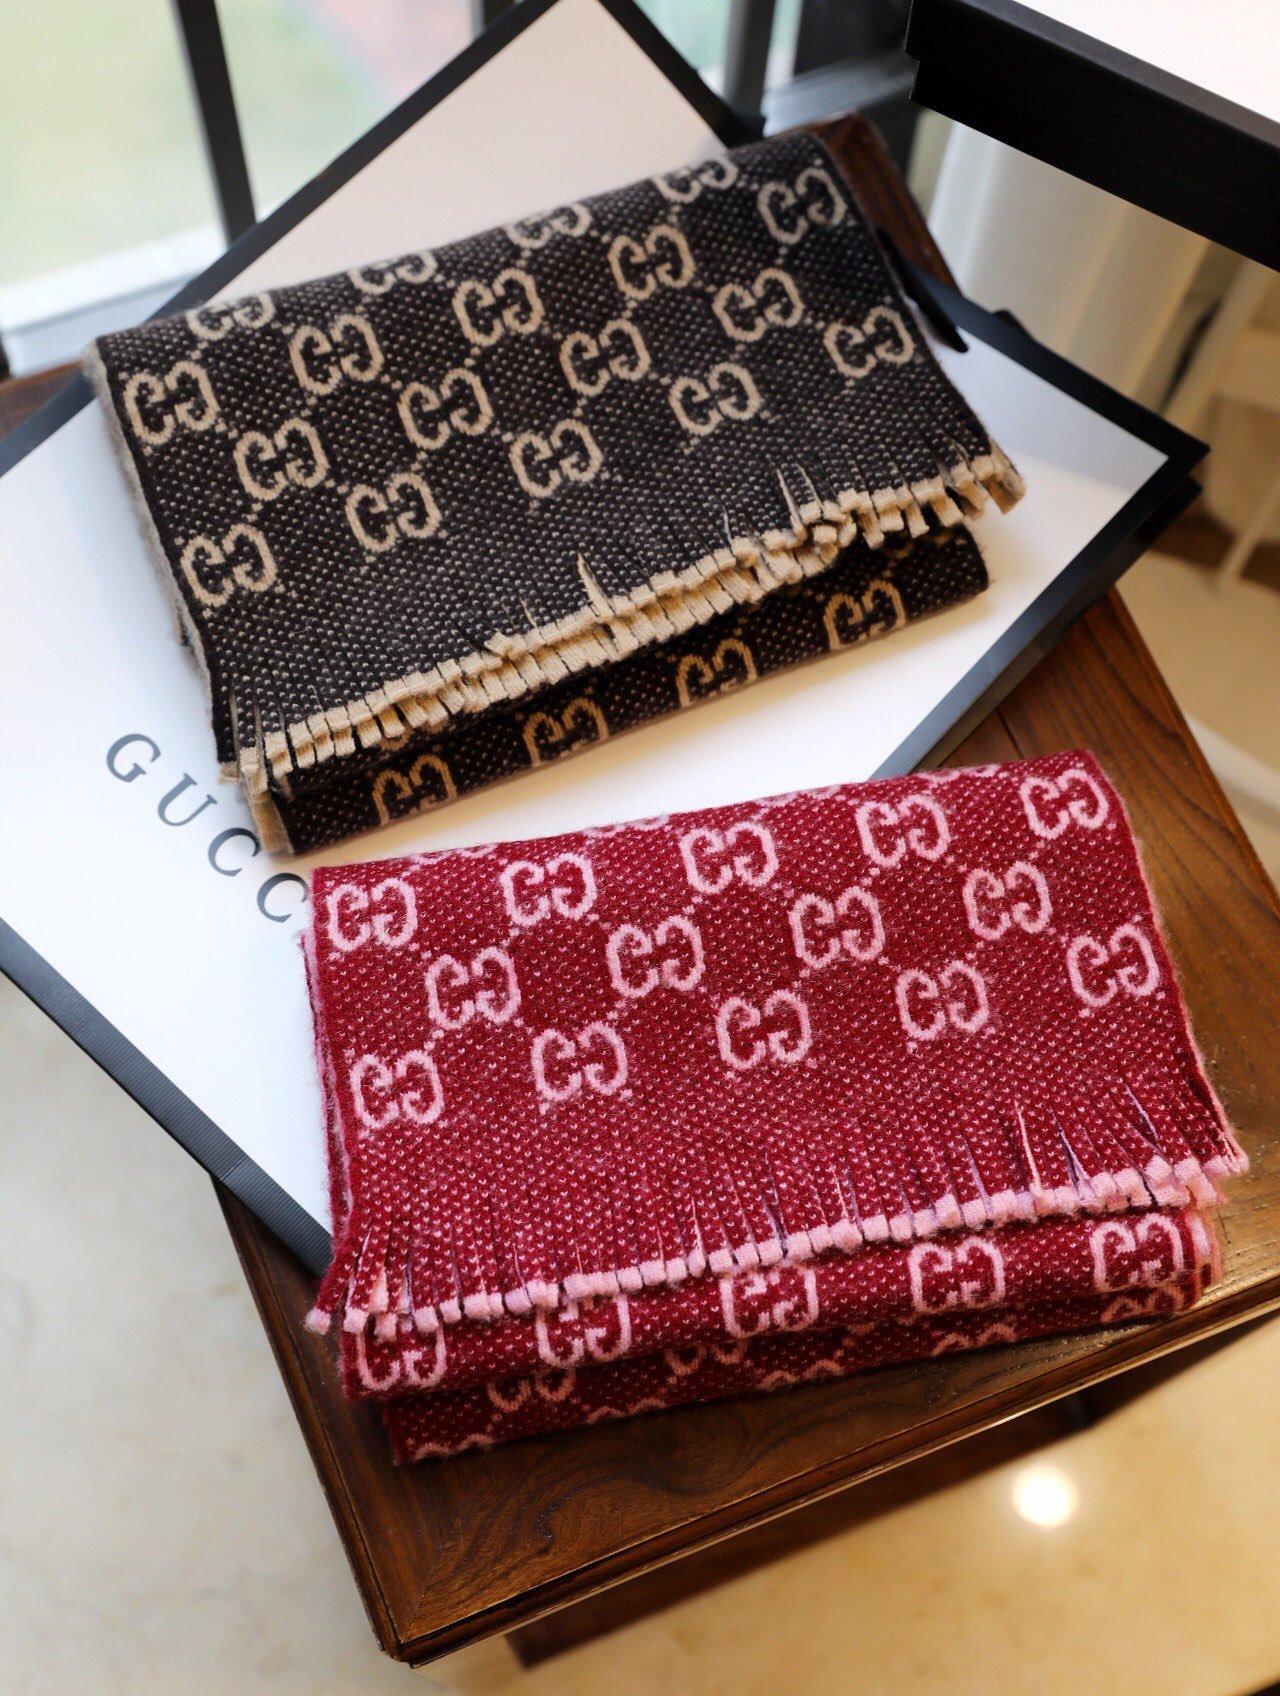 Gucci双G字母交织图案焕新演绎为